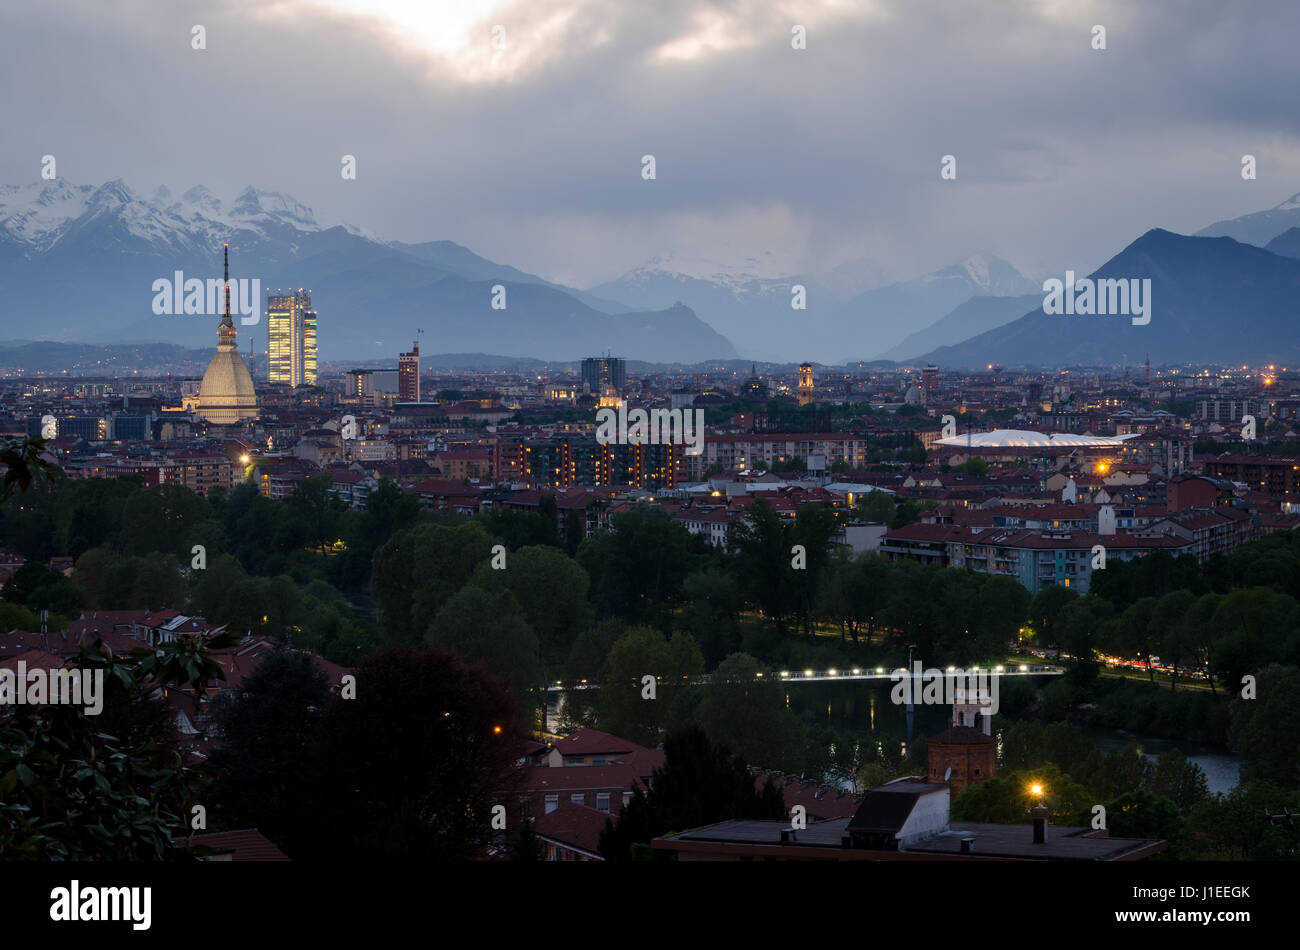 Torino, skyline with Mole Antonelliana and Susa Valley Stock Photo